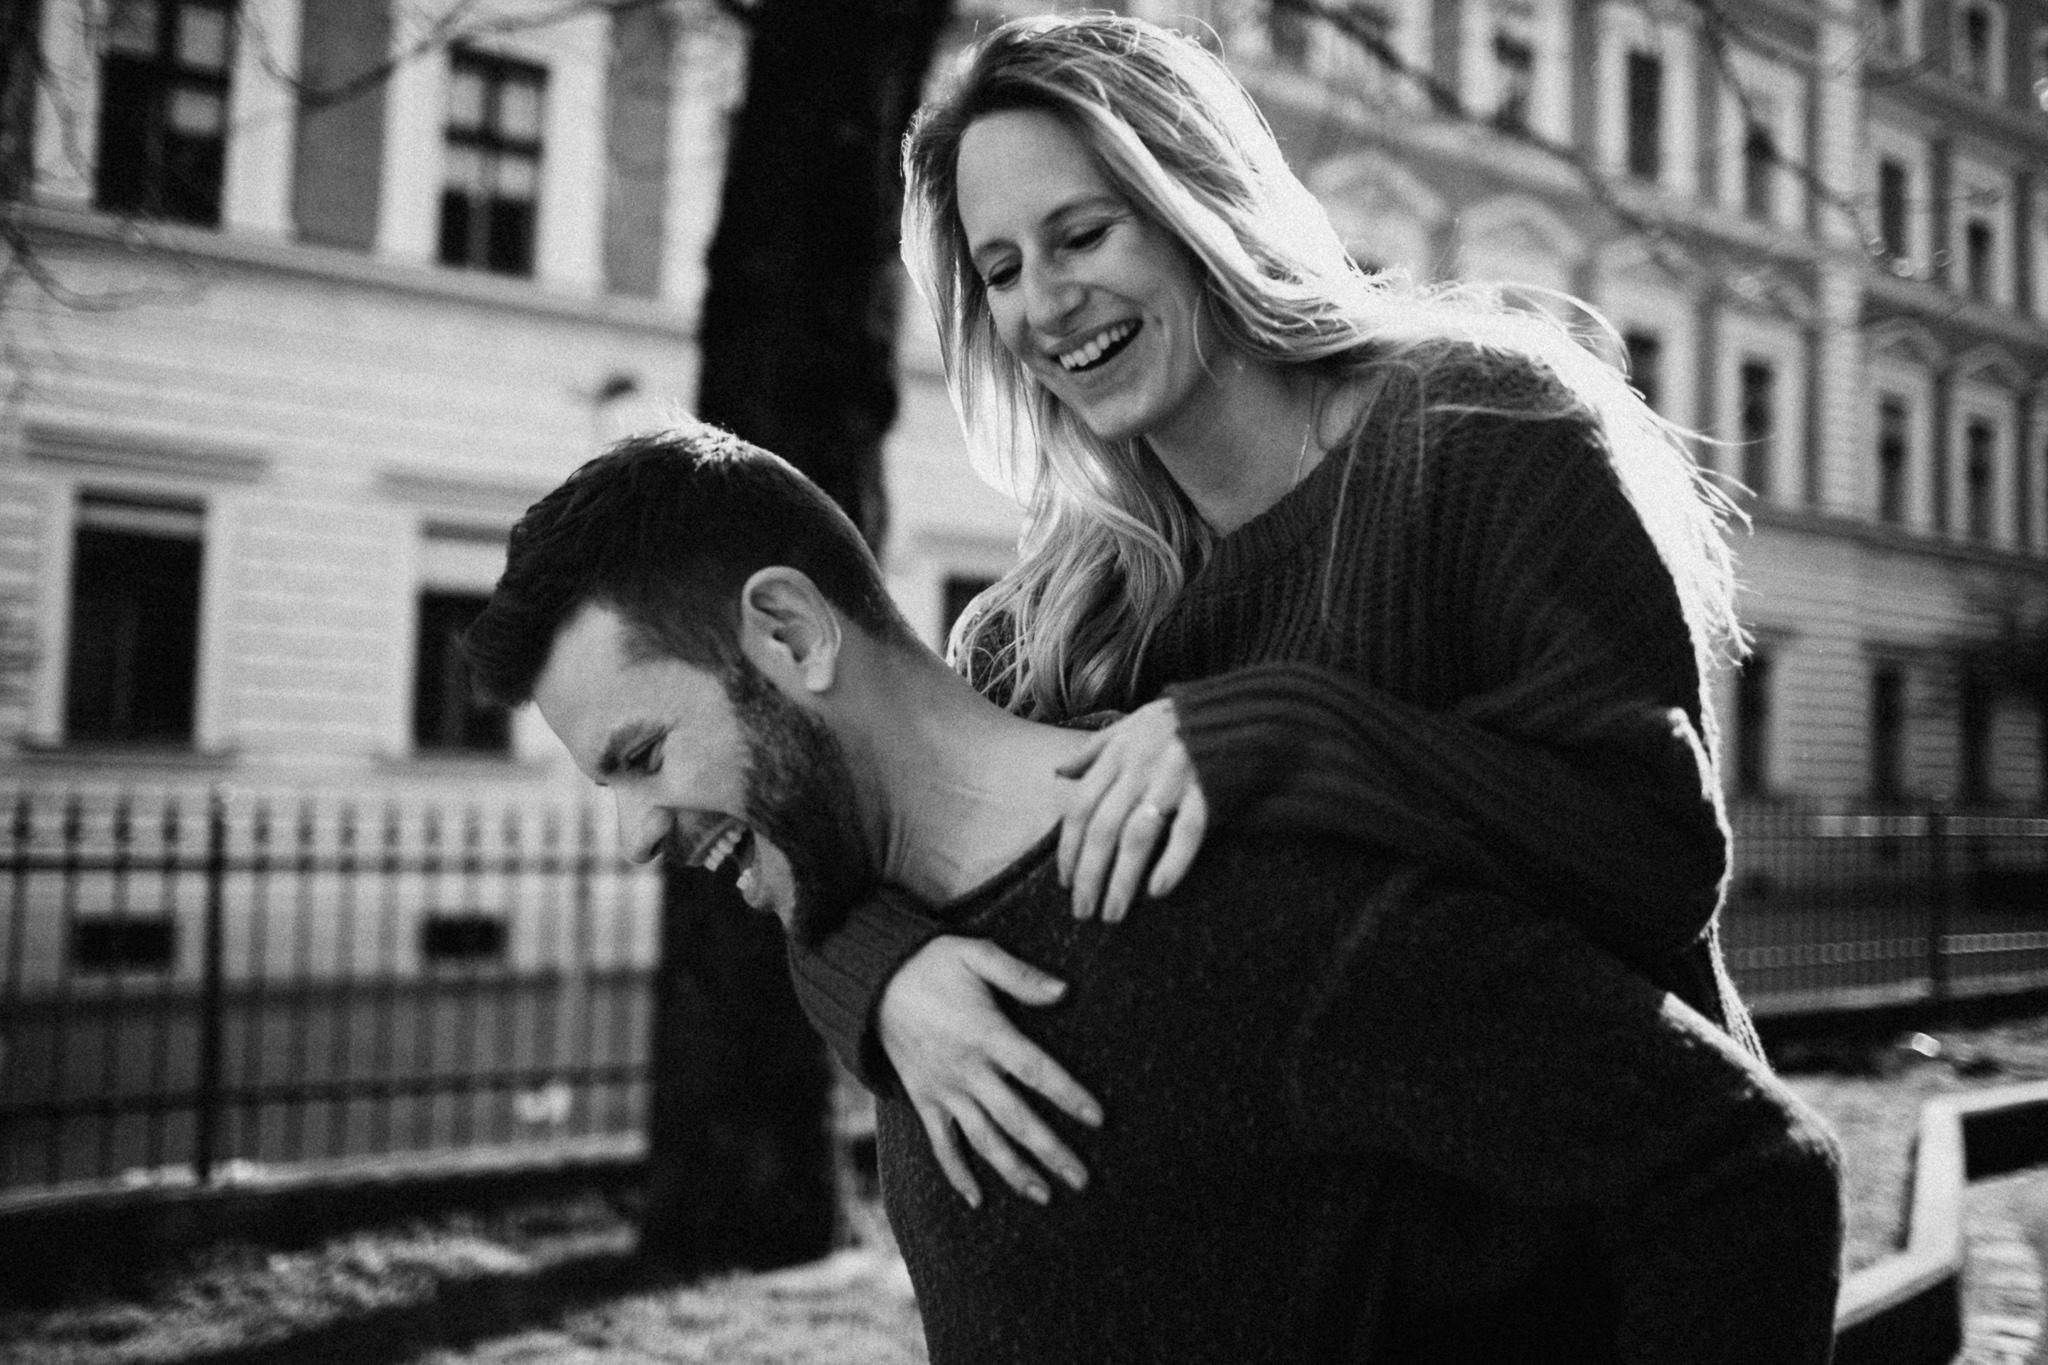 couples photographer in vienna - sarah longworth